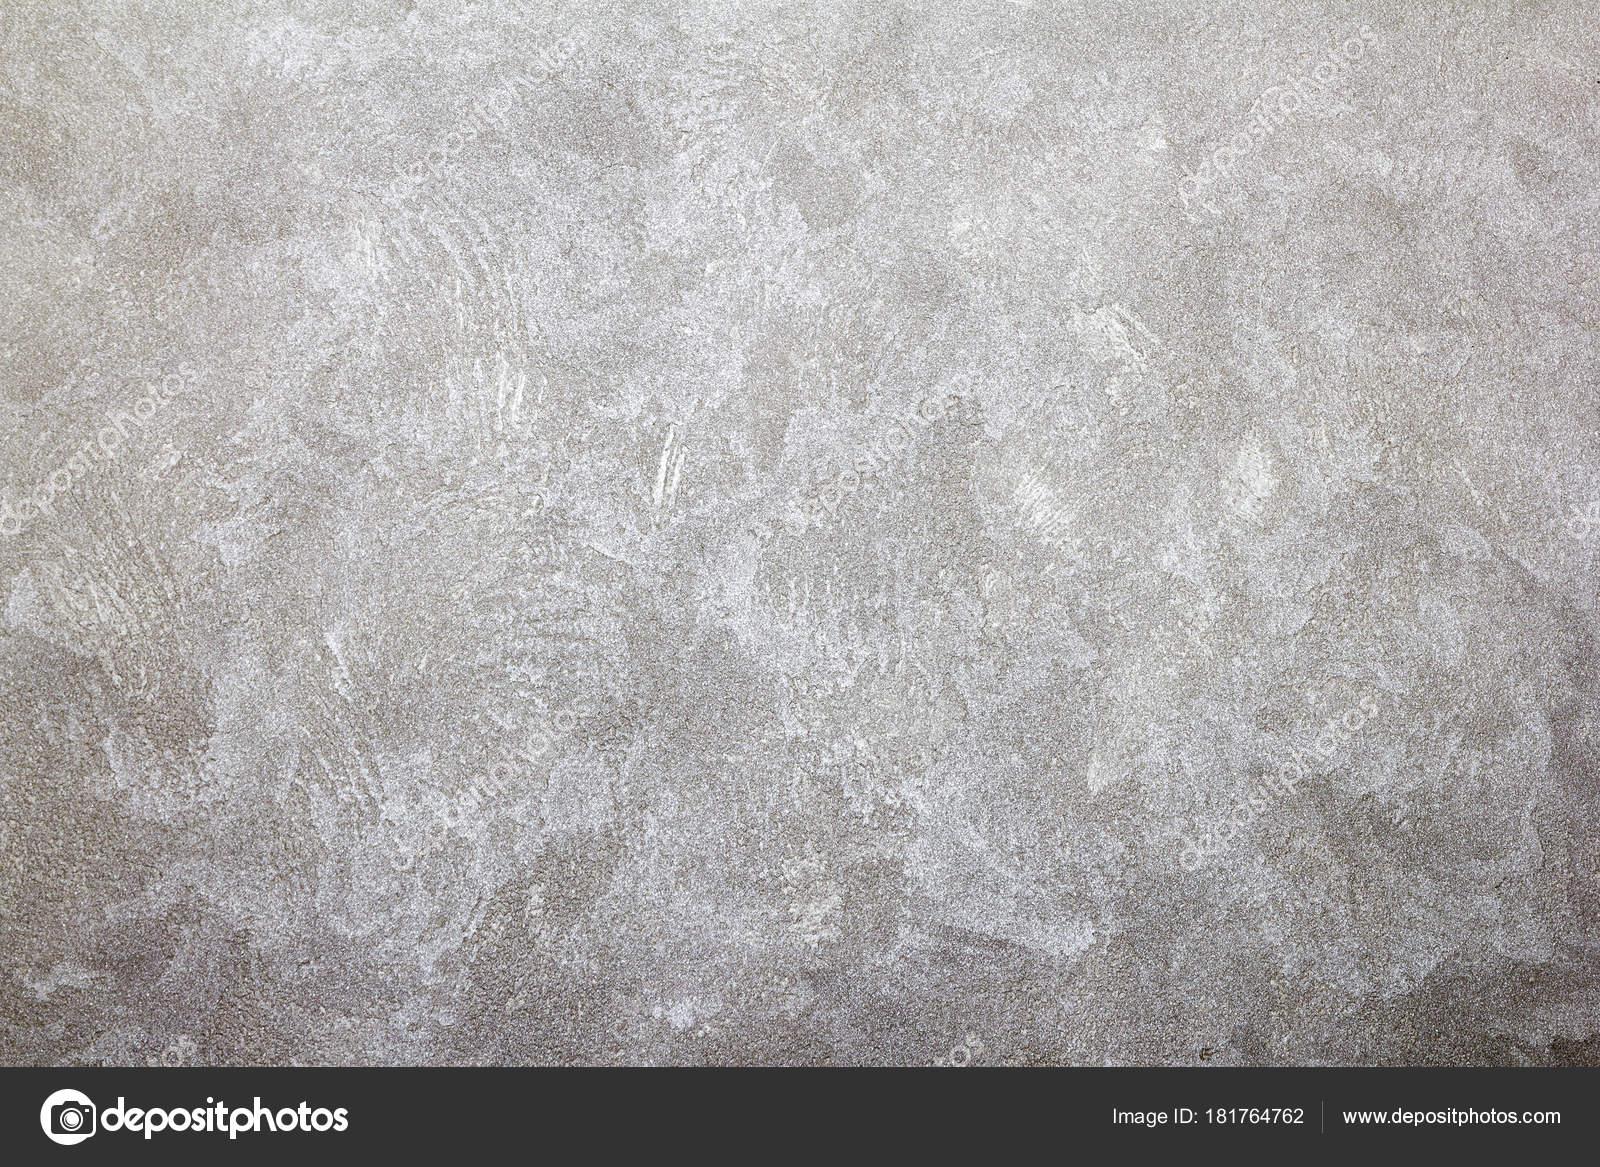 dekorative wandputz — stockfoto © rokvel #181764762